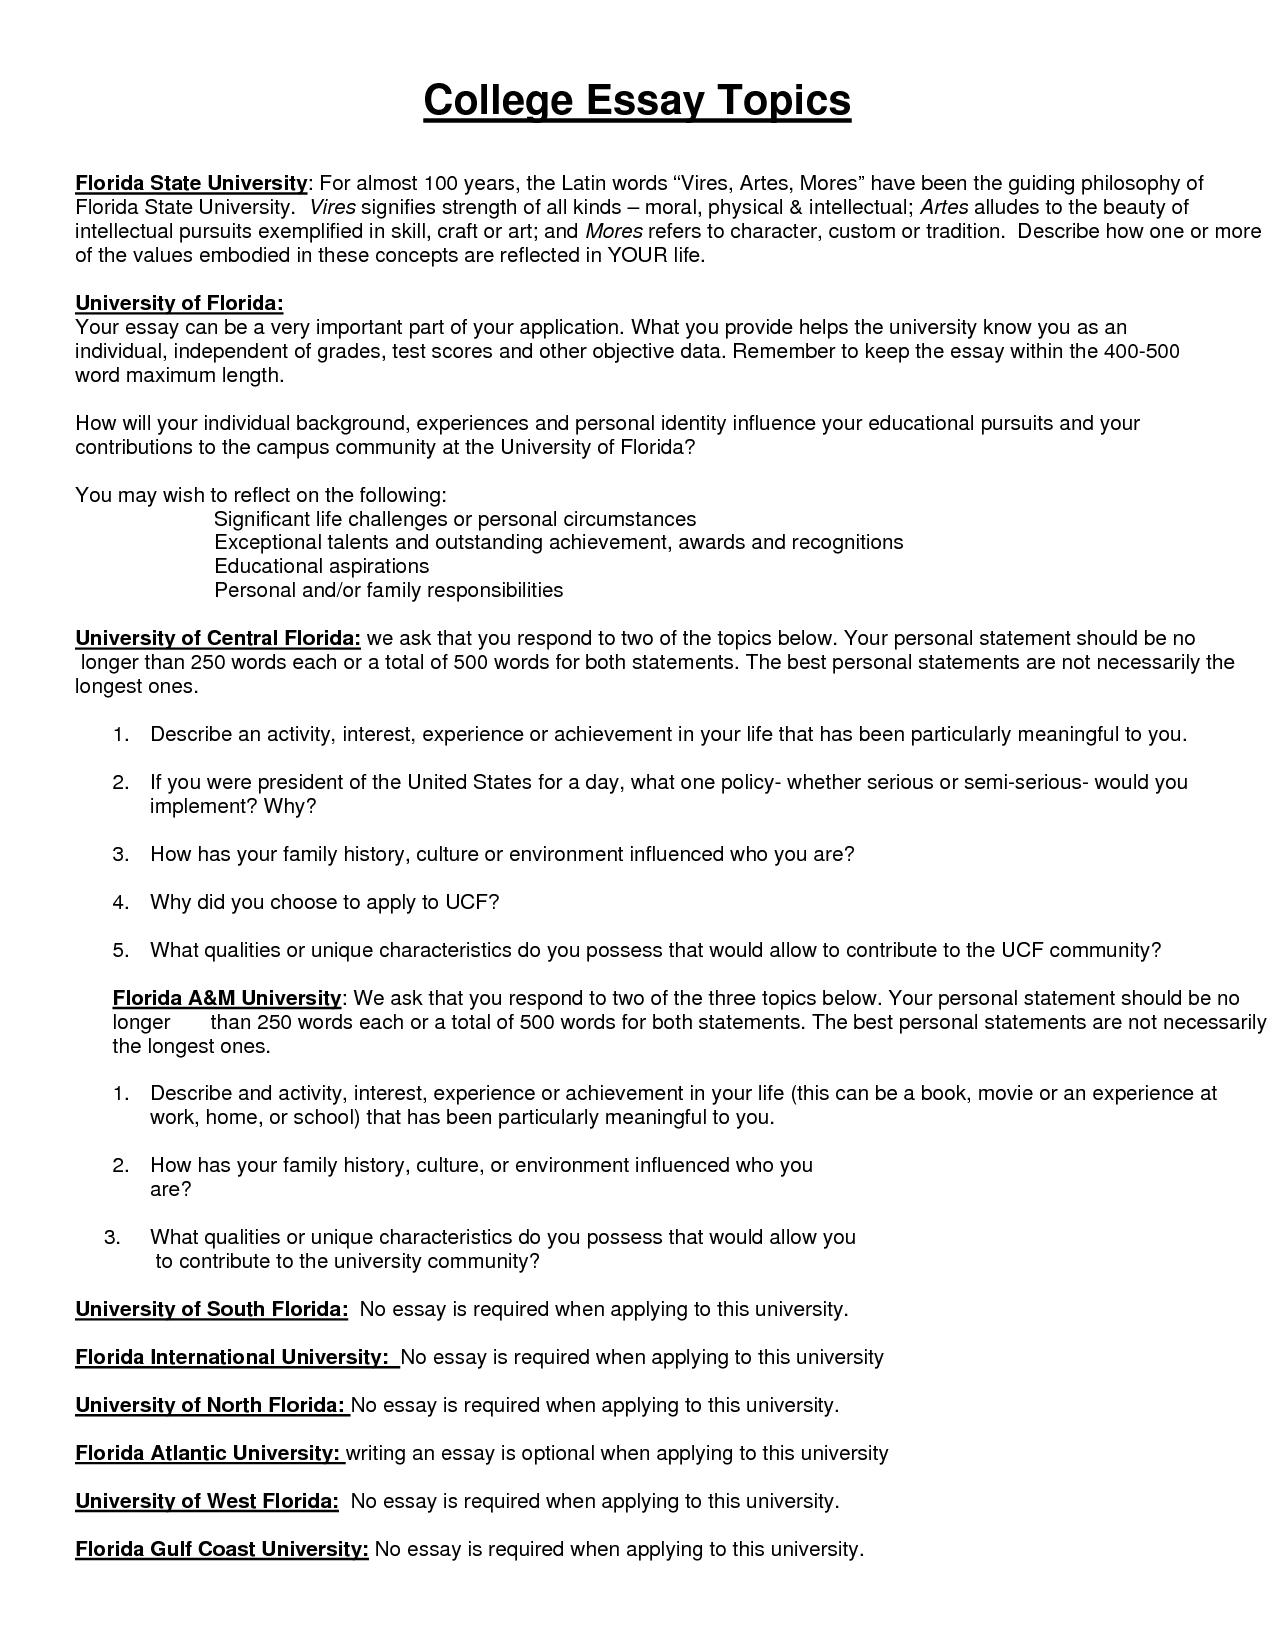 003 Essay Example 4khqbt5dlt Creative College Marvelous Topics List Interesting 2018 Full